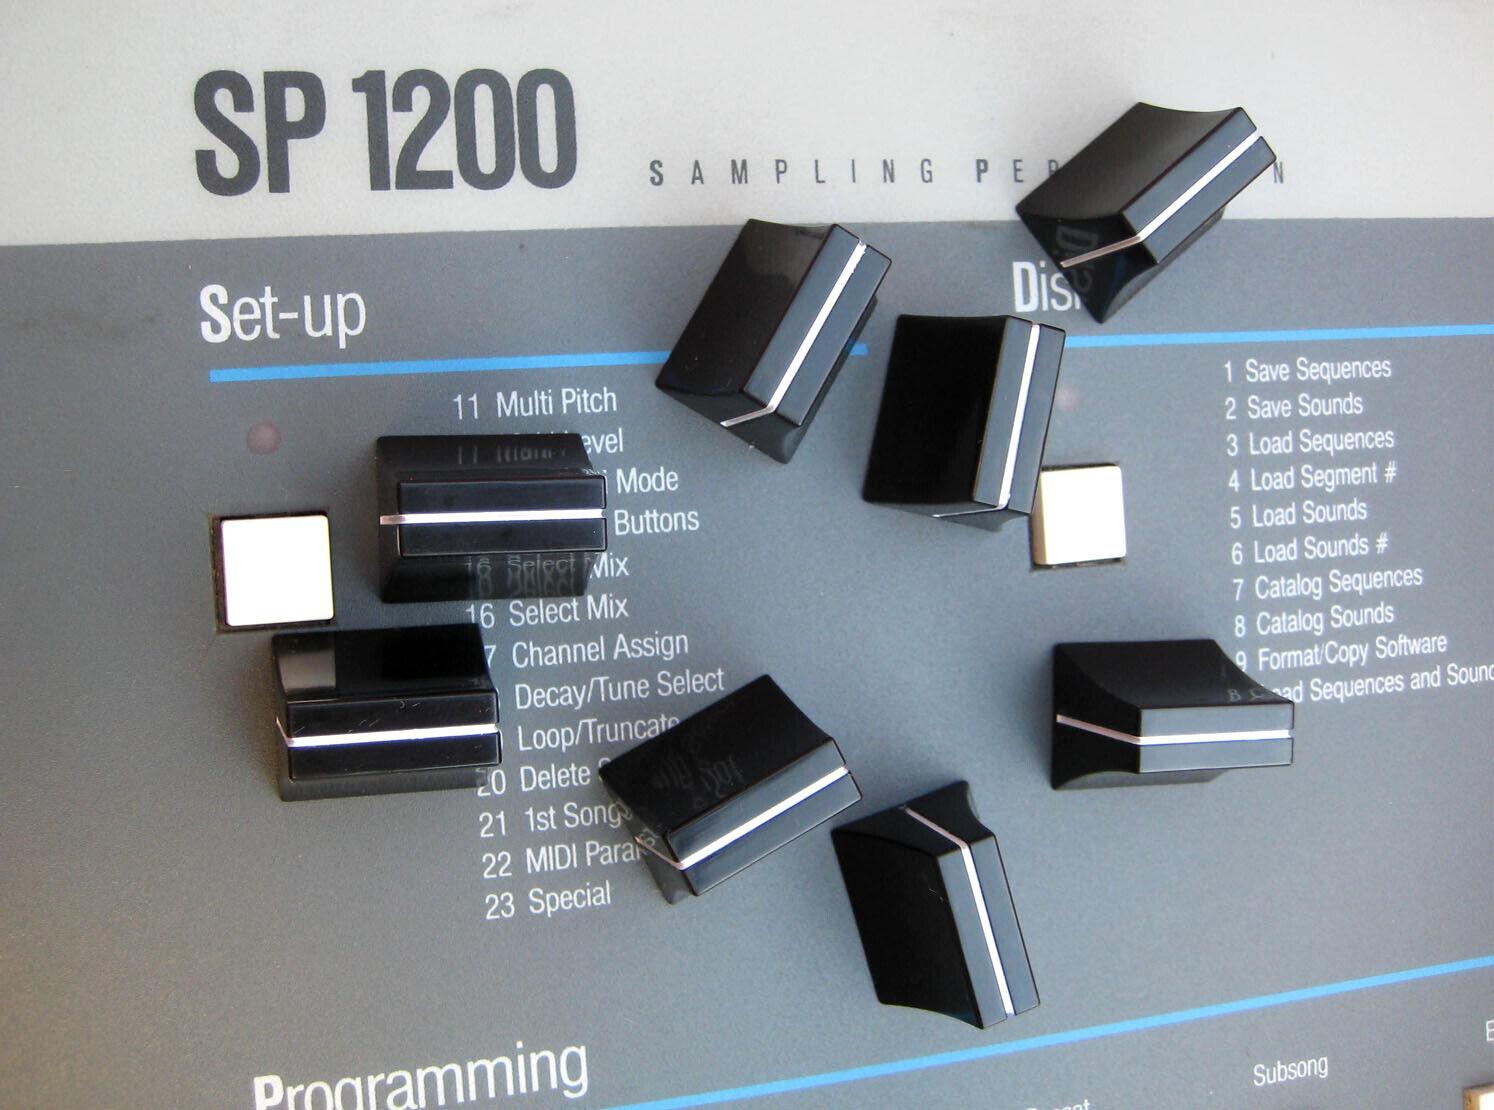 VERY COOL Shiny Fat Cap Slider Caps for E-mu SP1200 -Full Set of 8 New NOS-MINT